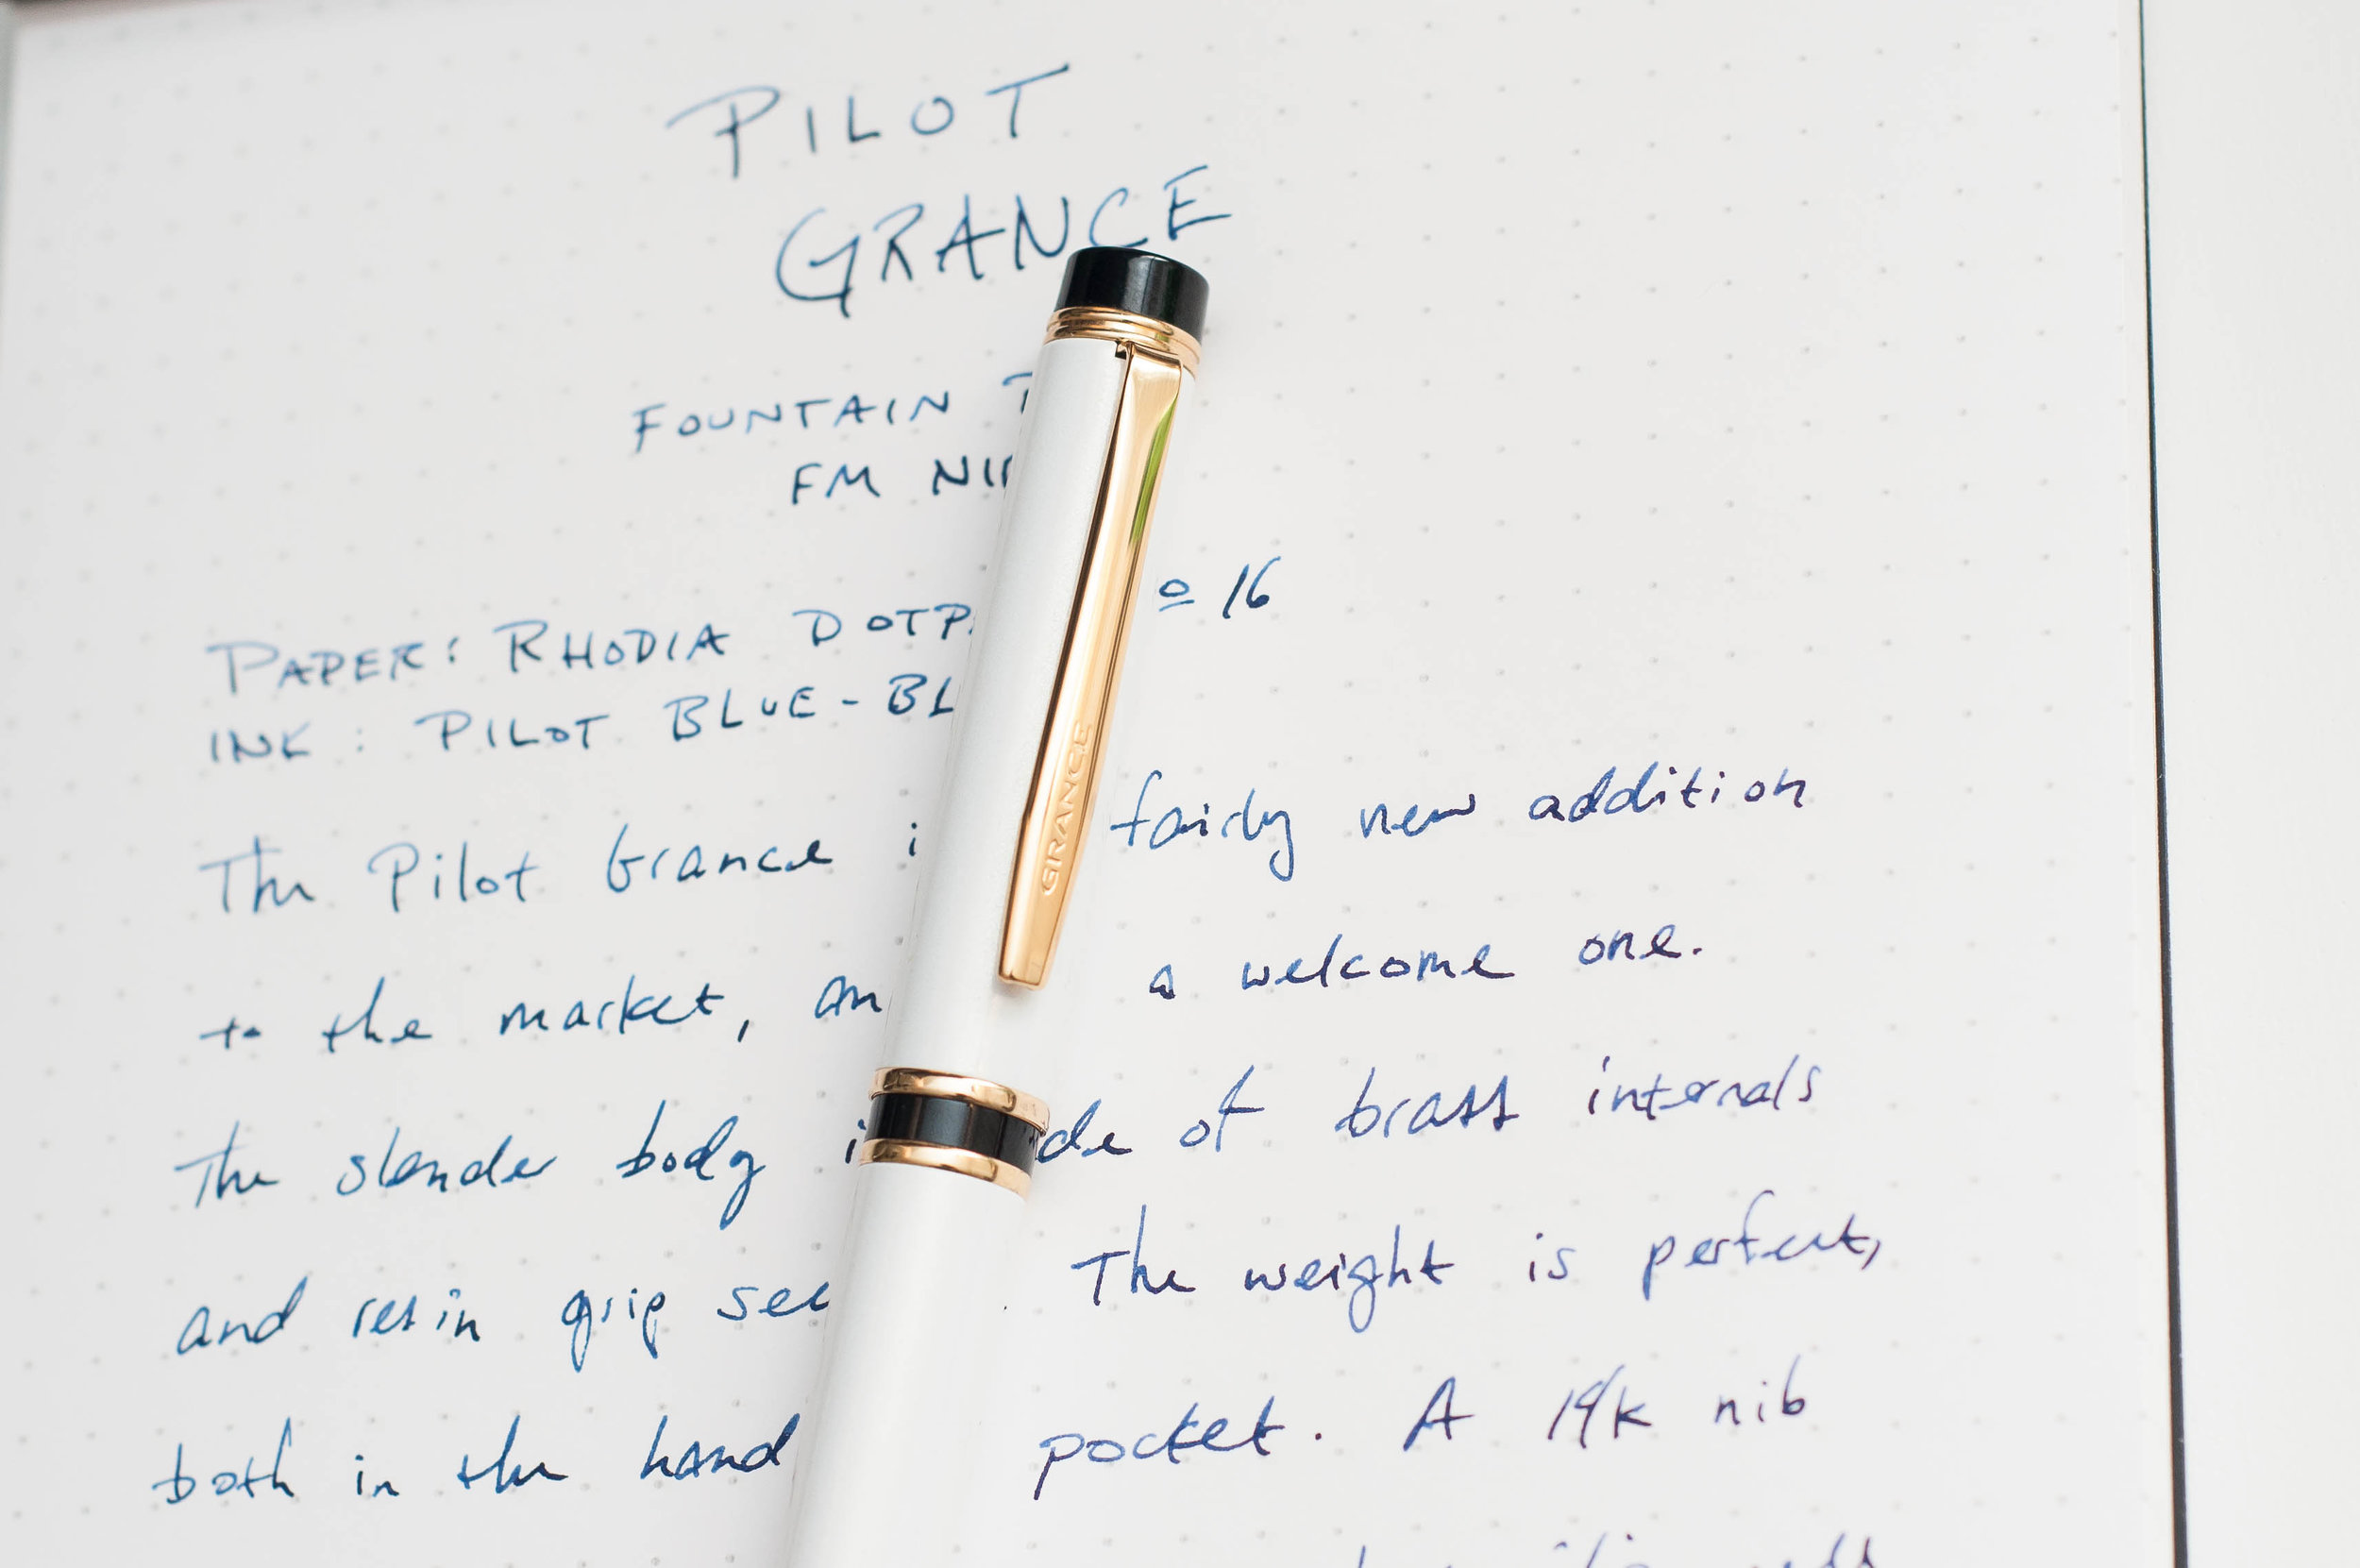 Pilot Grance Fountain Pen Cap